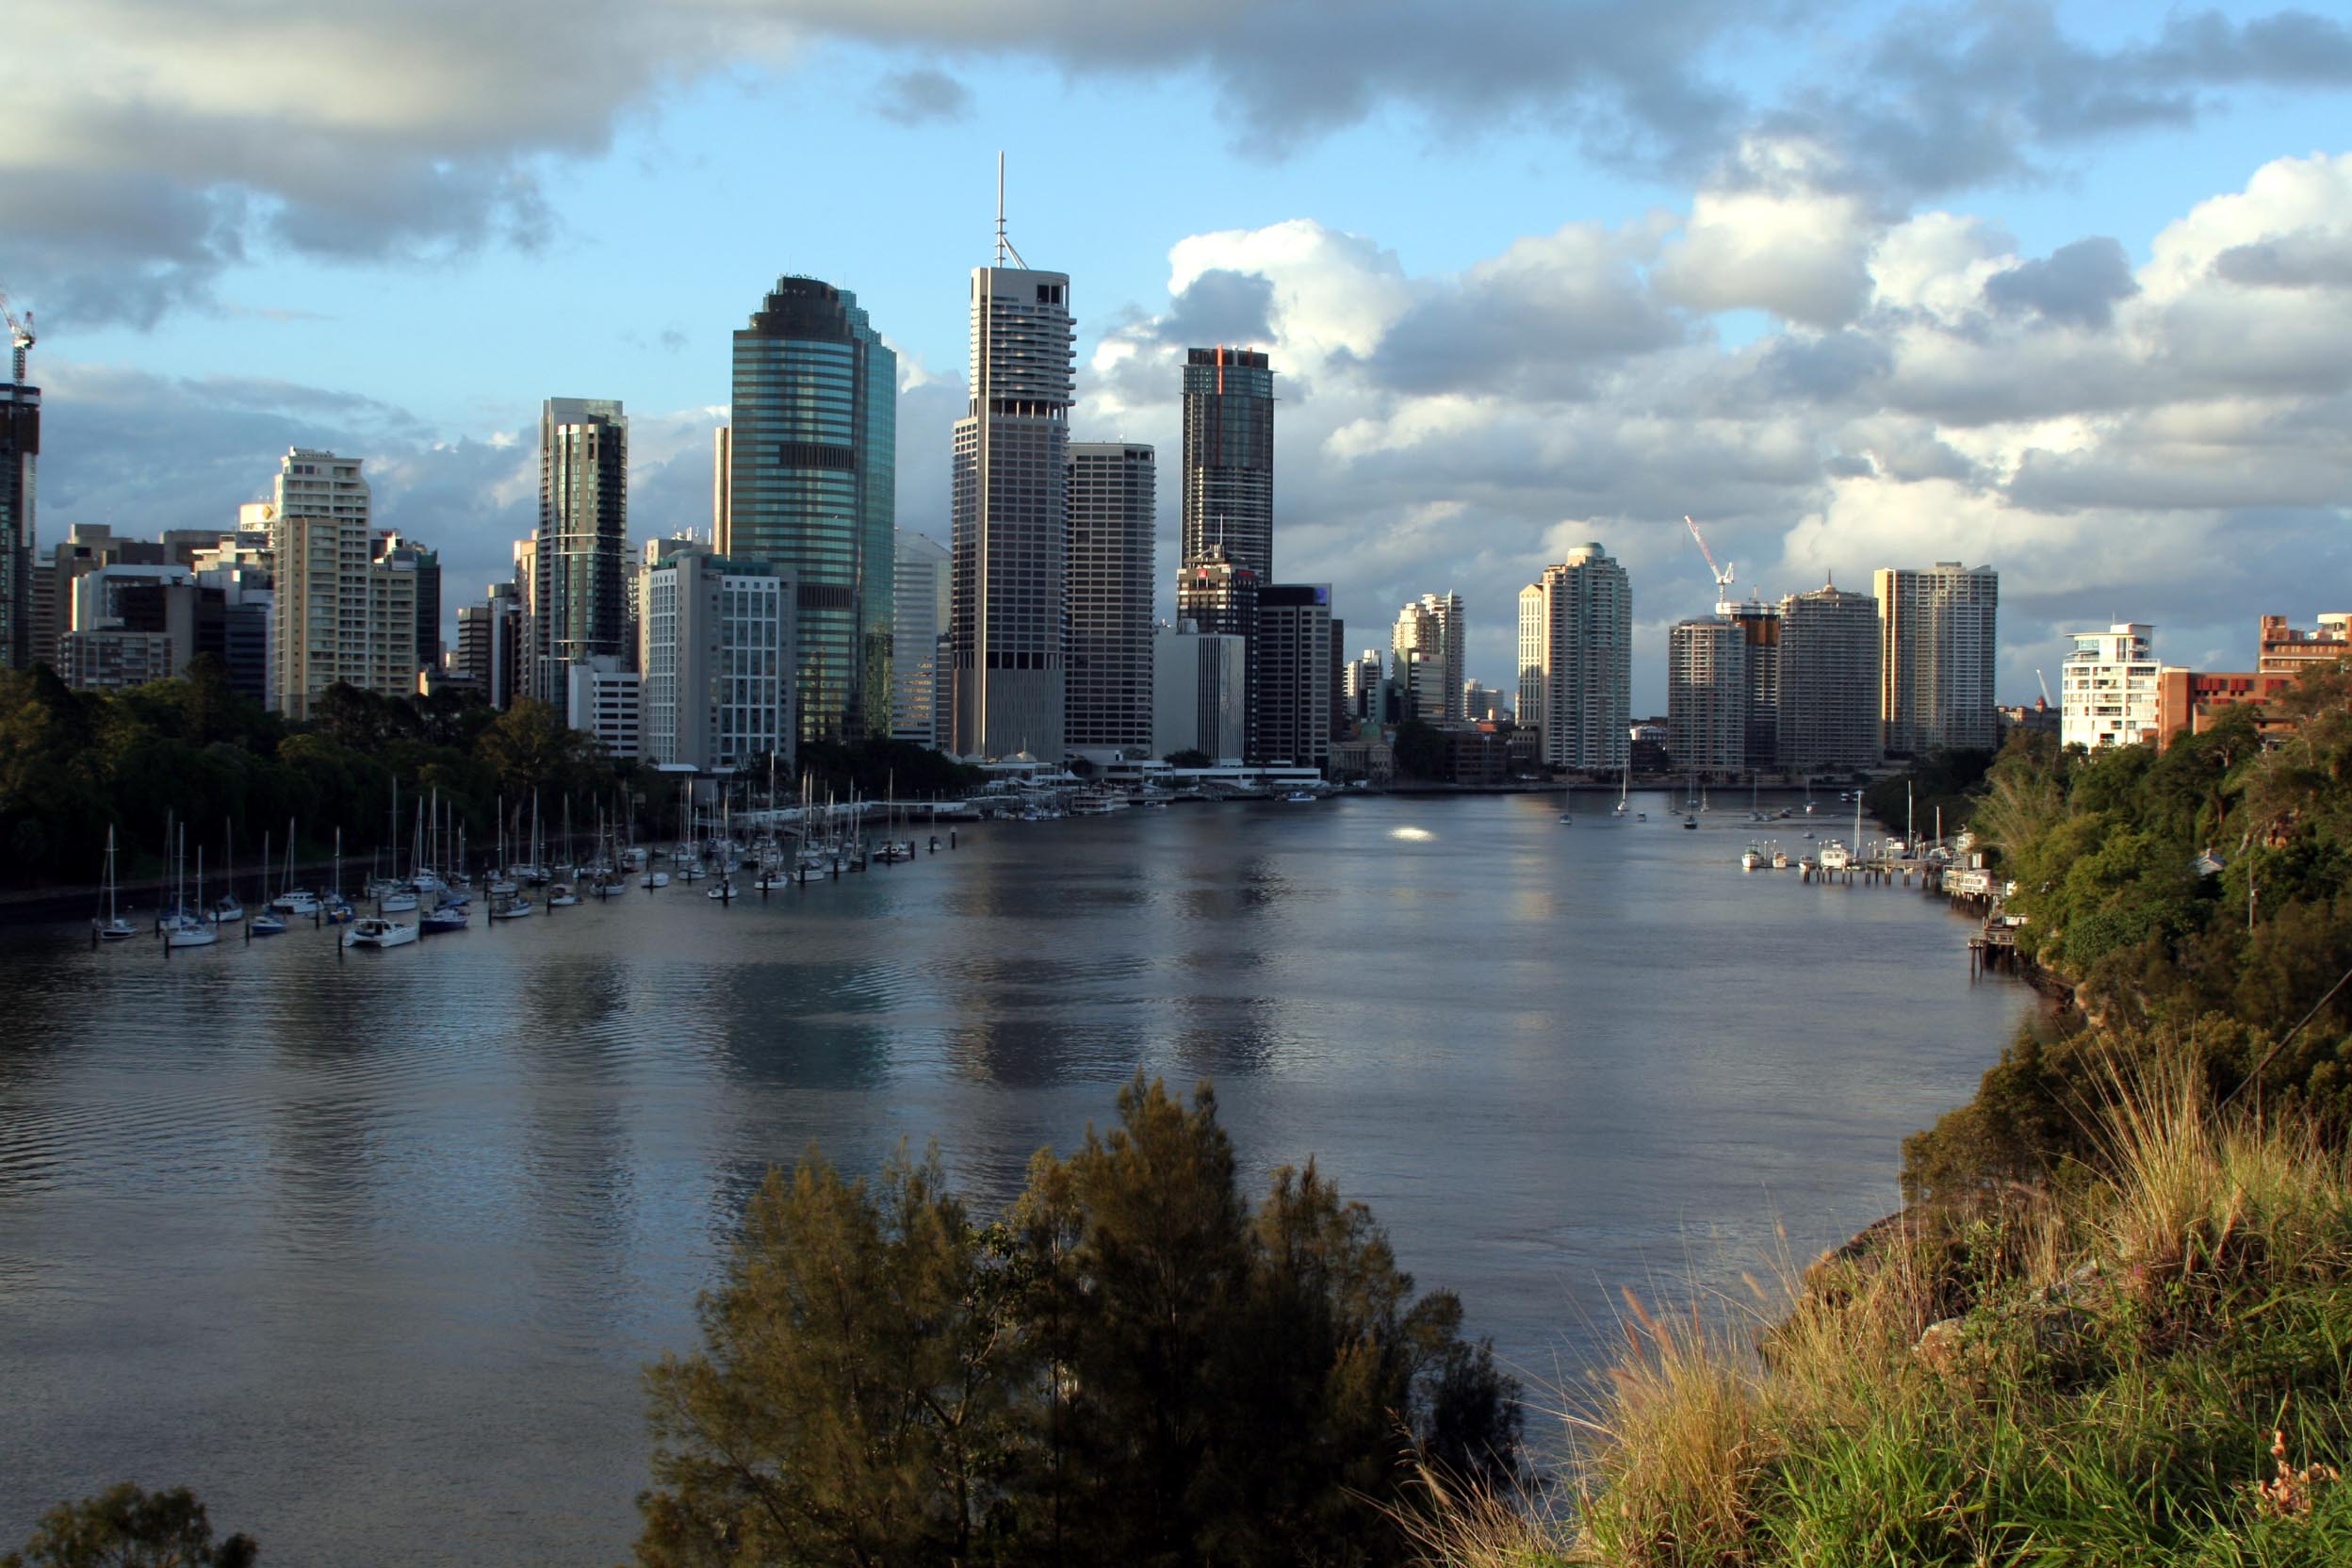 Brisbane River from Kangaroo Point